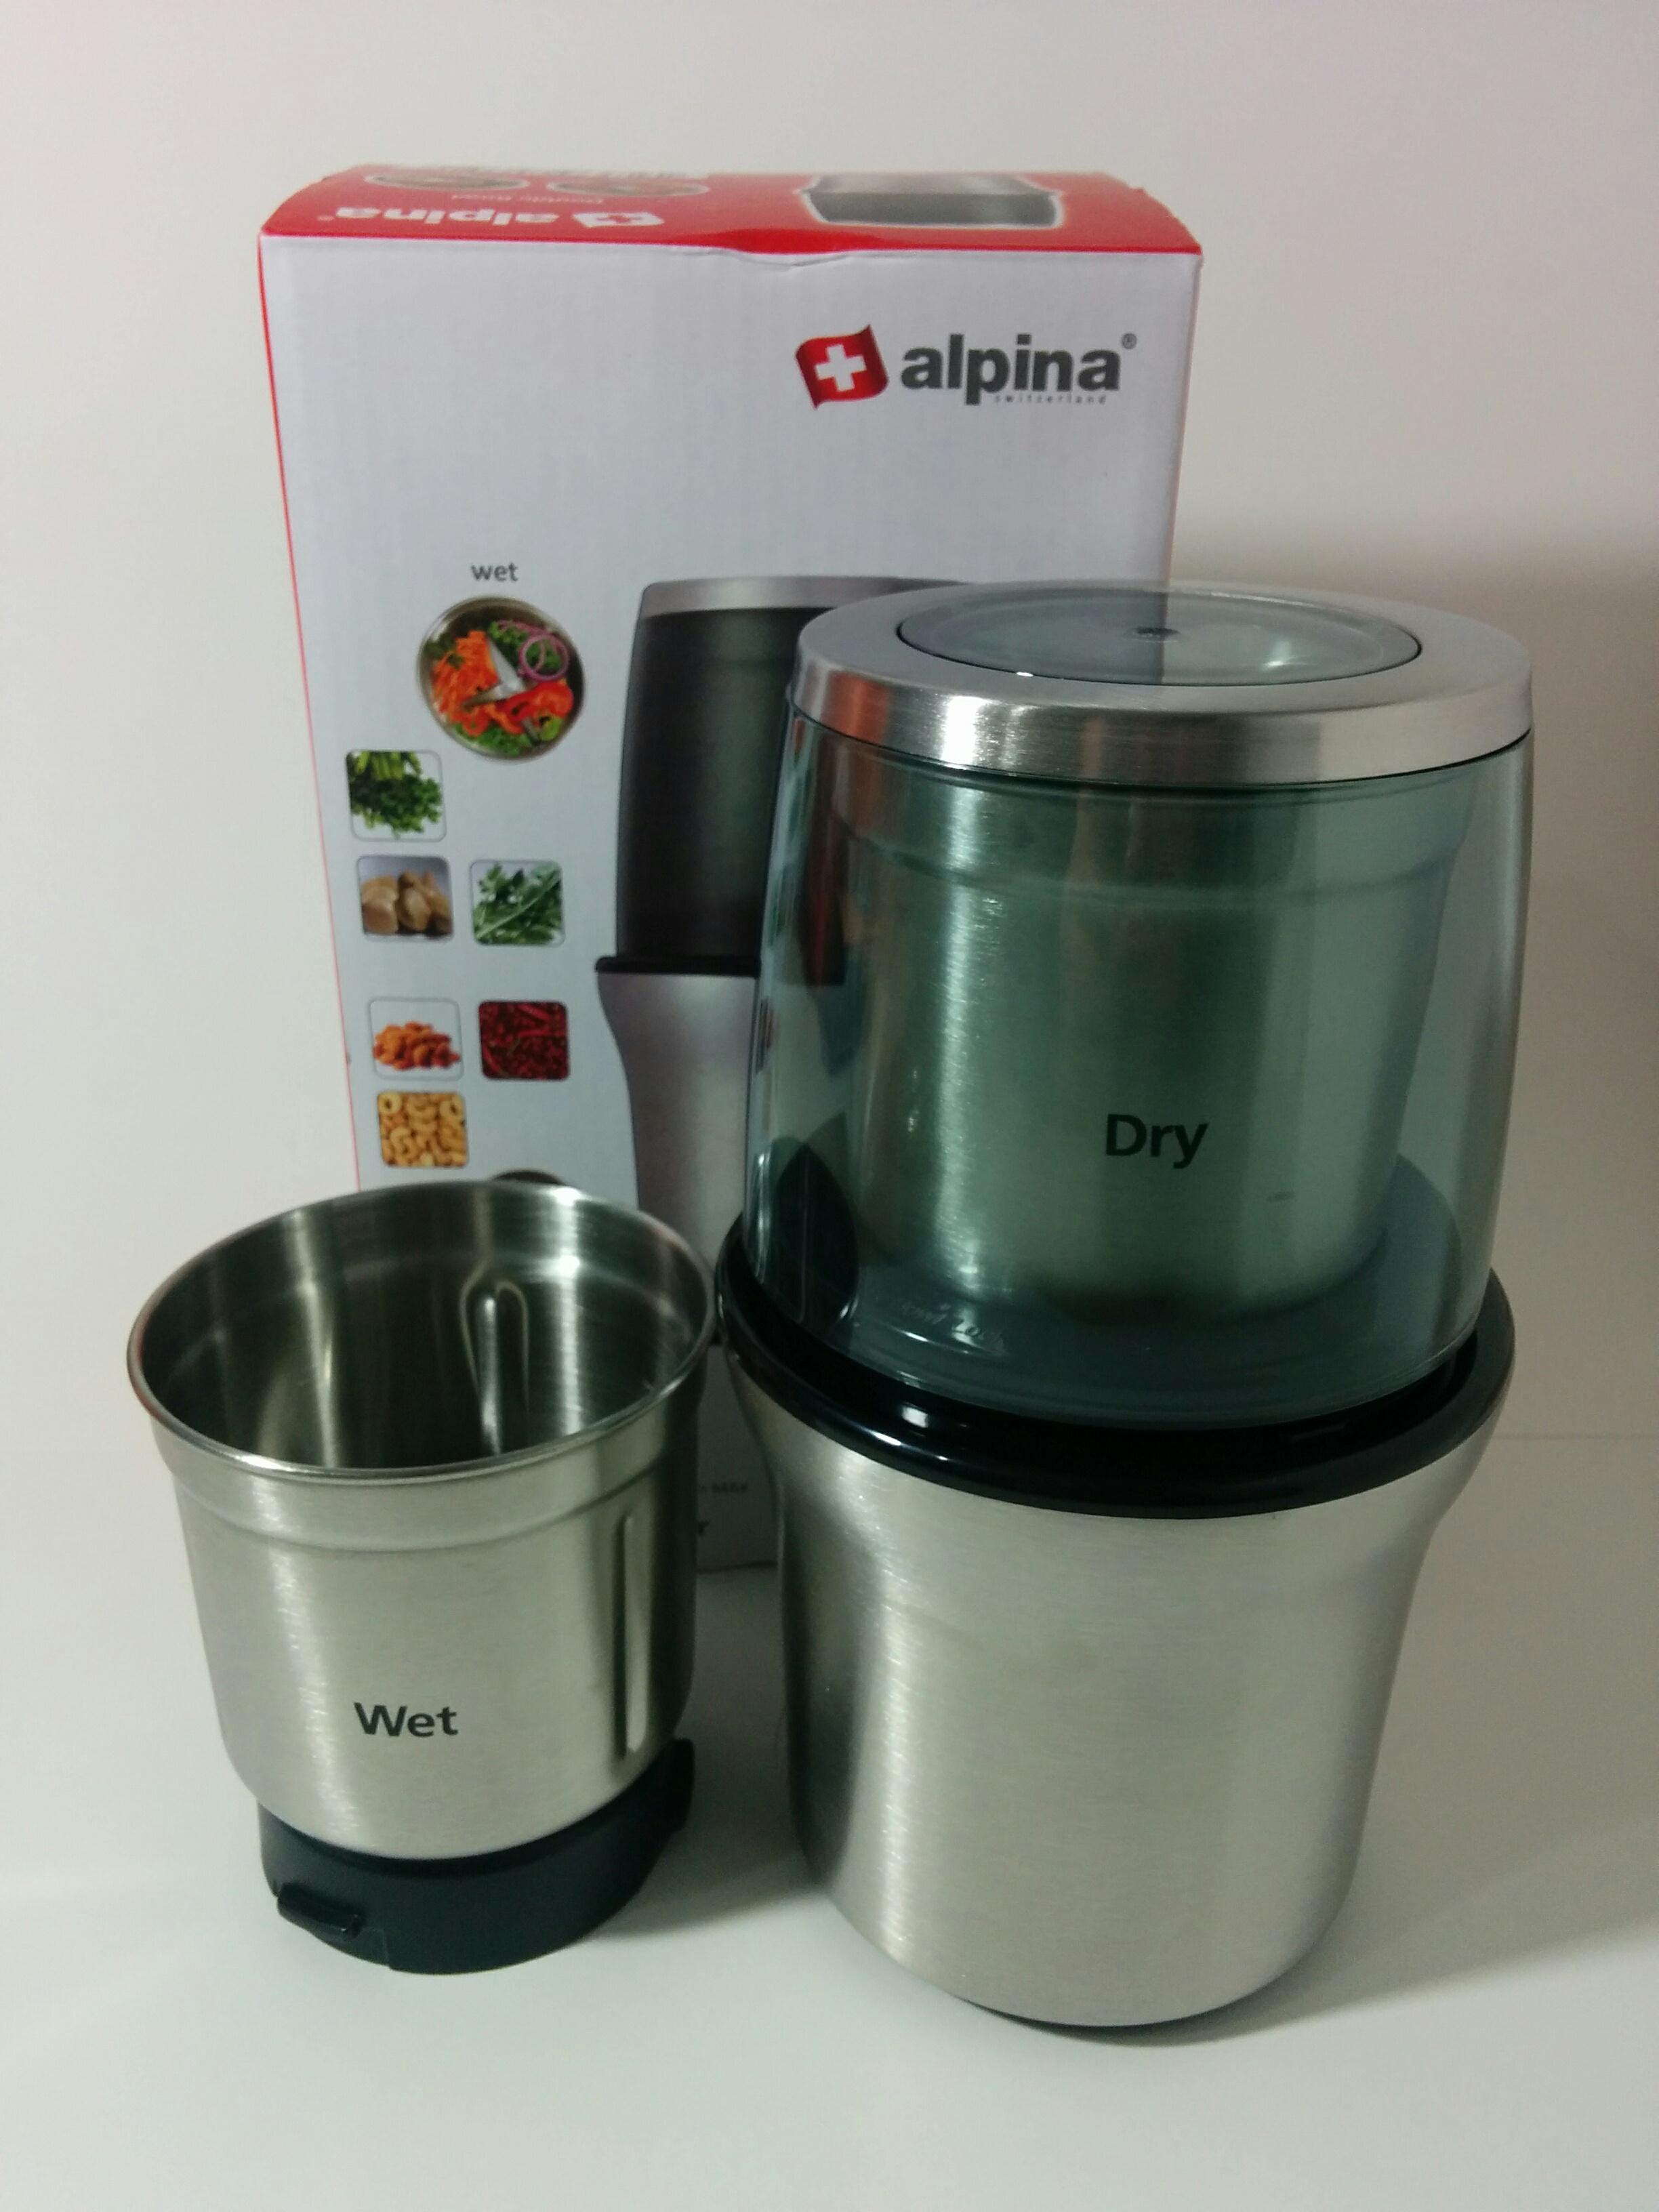 Alpina Wet Amp Dry Grinder A To Z Appliances